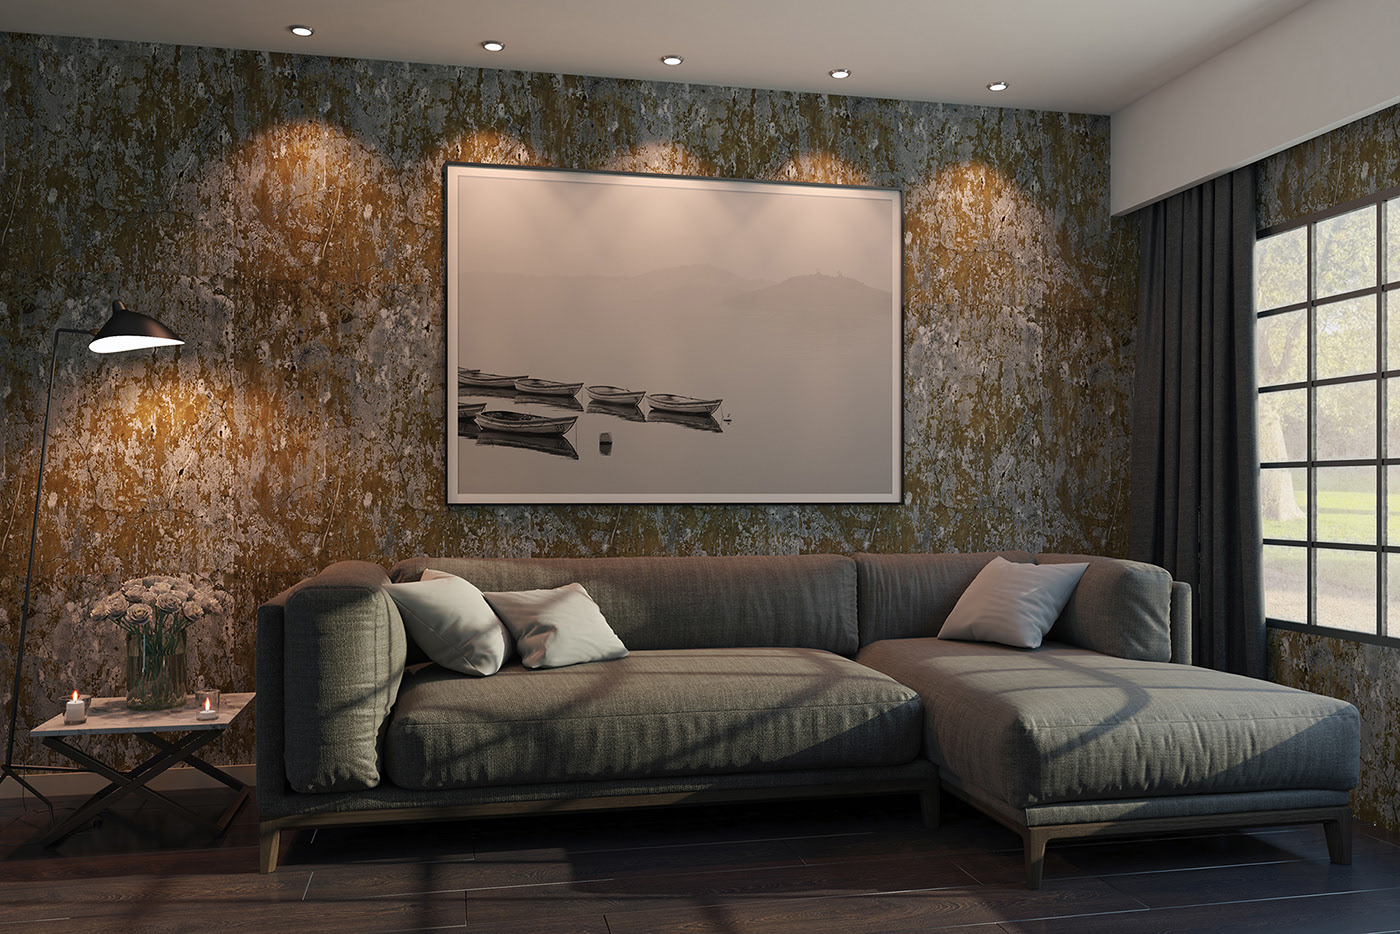 Living Room Poster Mockup